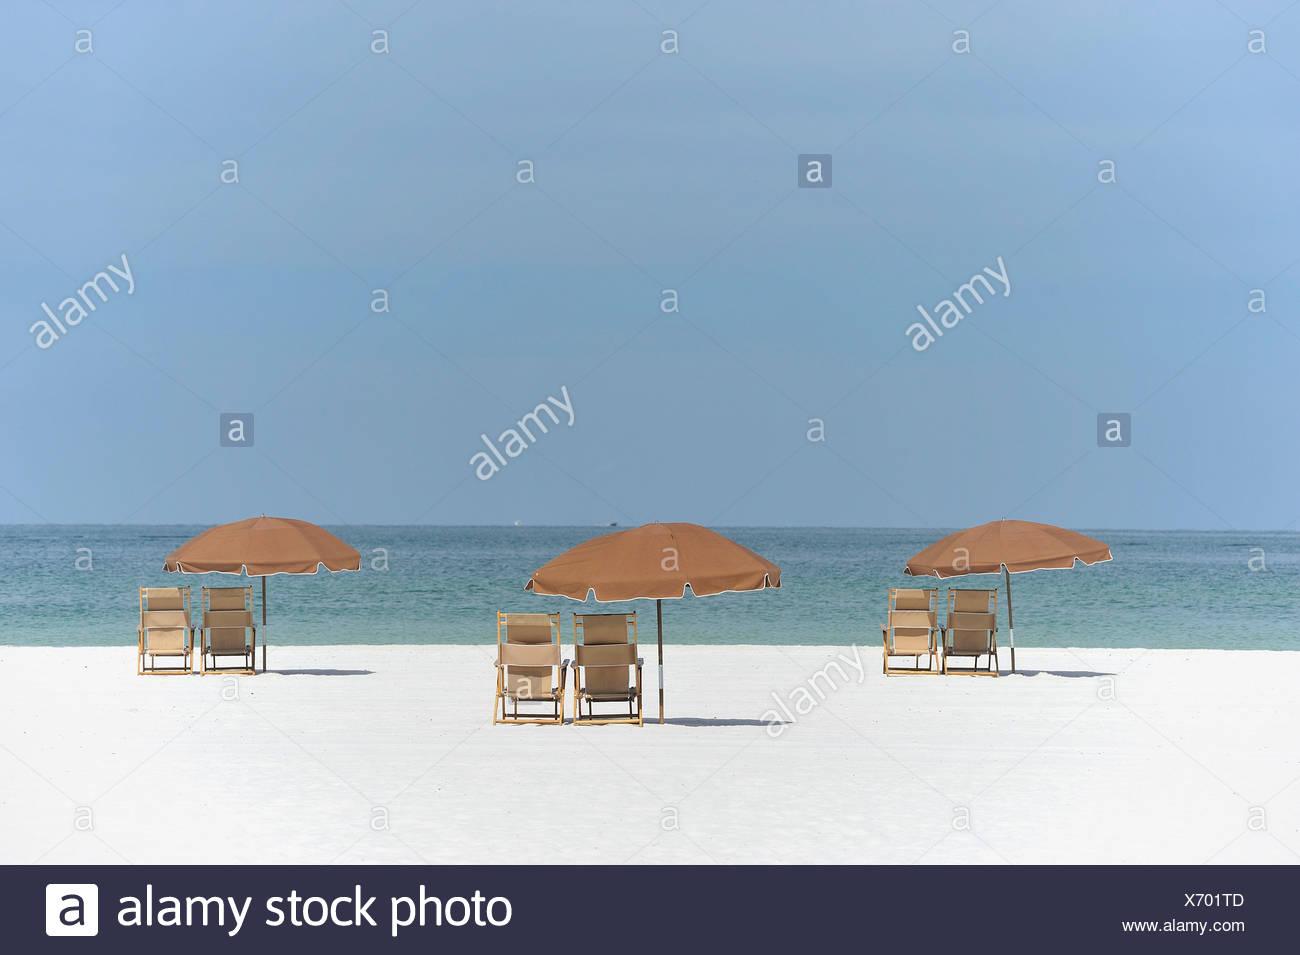 Strand, Stühle, Sonnenschirme, weiß, Sand, Strand, Golf, Meer, Clearwater Beach, Florida, USA, Mexiko, Amerika, USA Stockbild